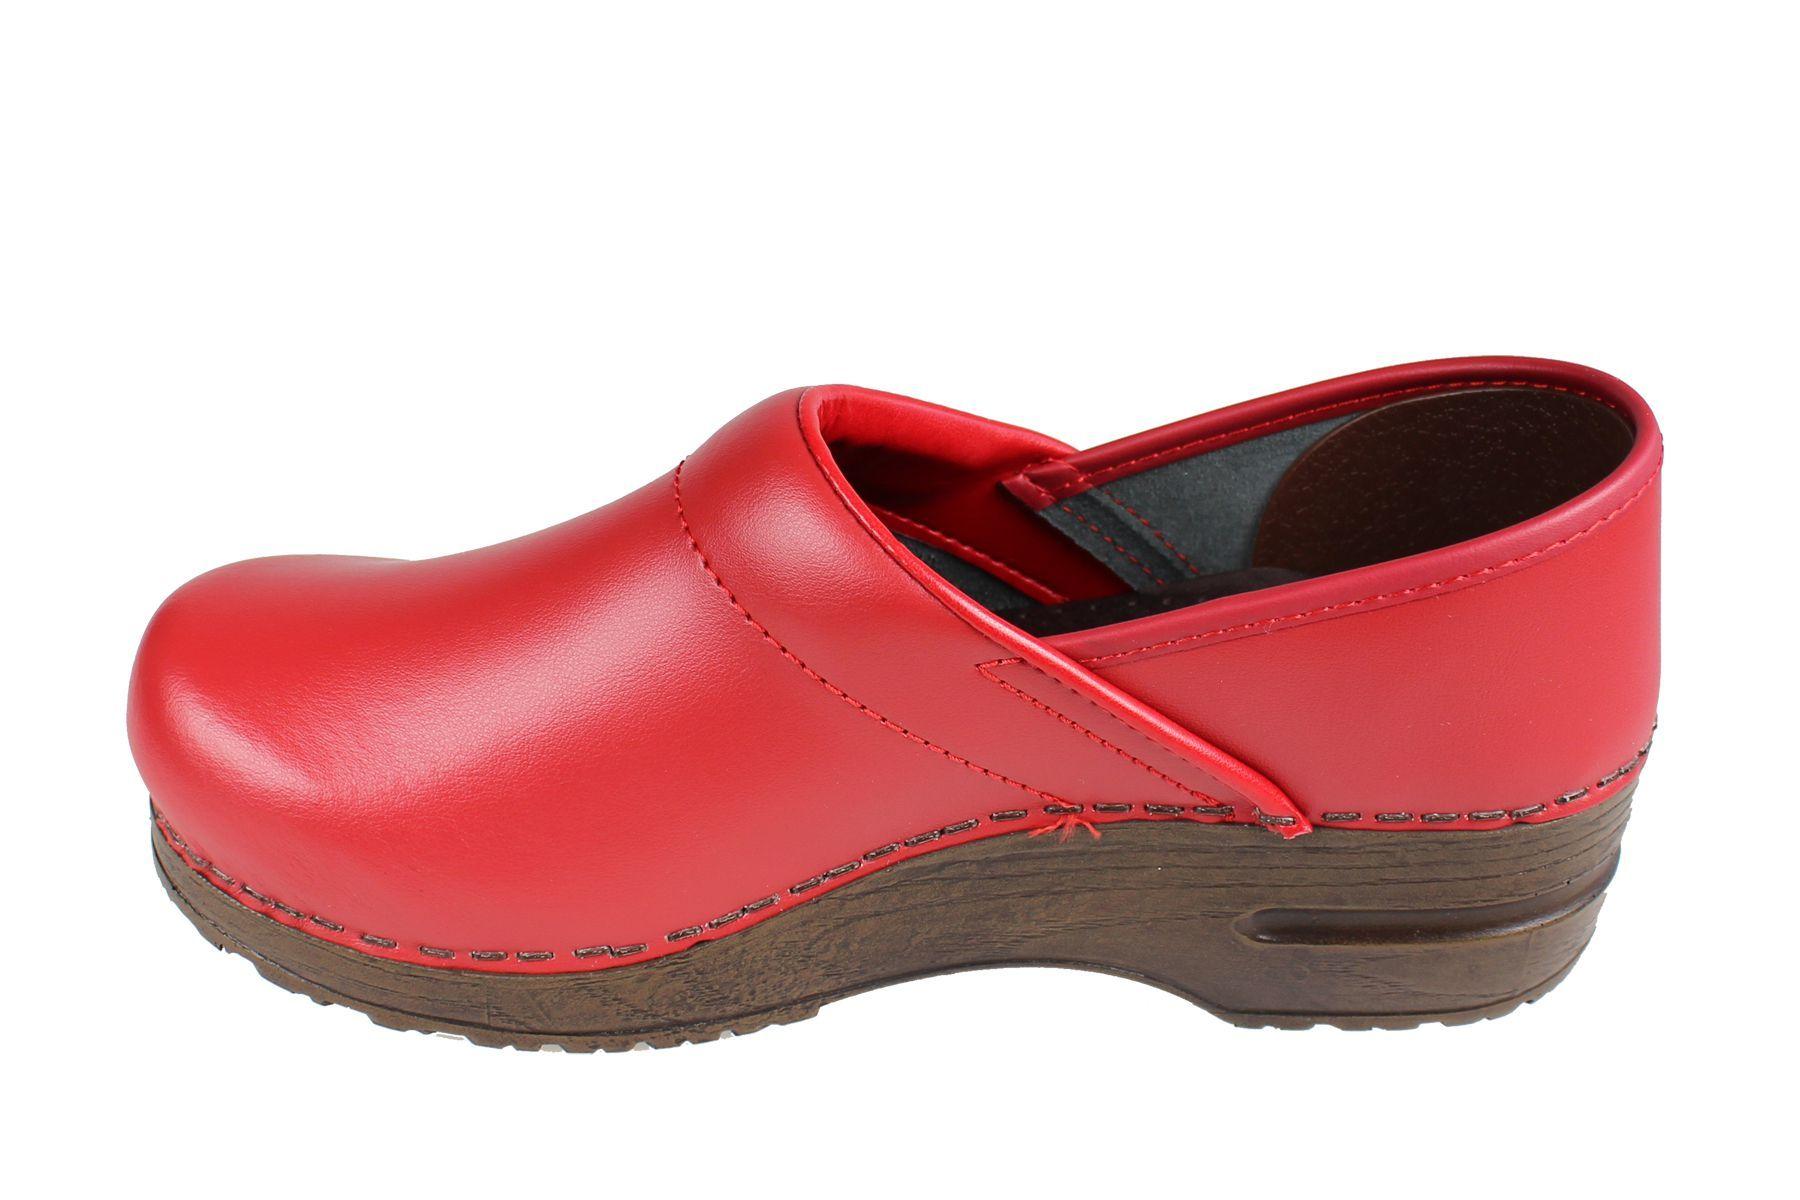 Sanita Izabella Clog in Red